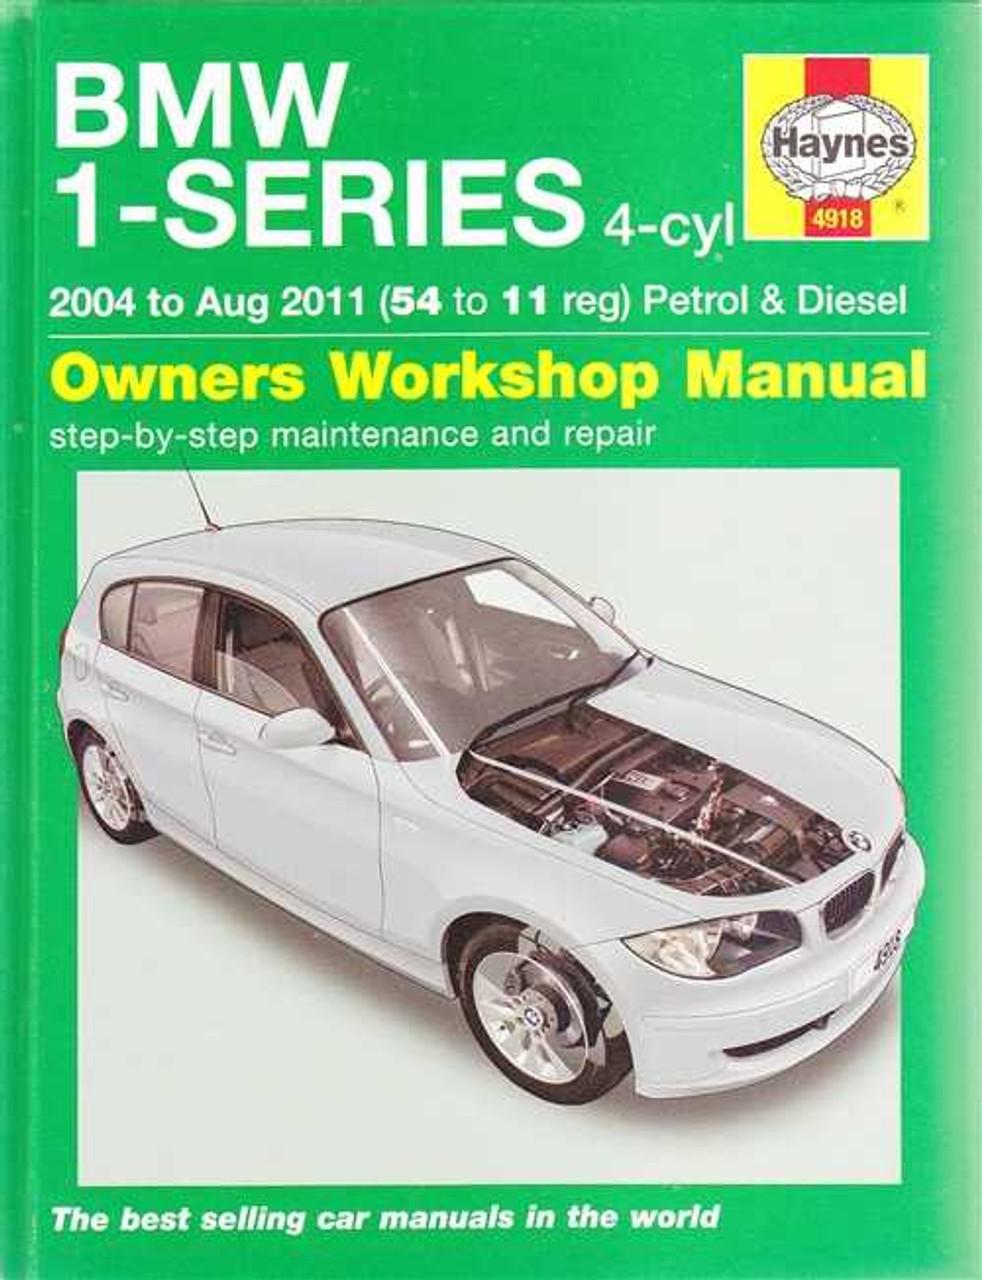 bmw 120i ownerns manual free owners manual u2022 rh wordworksbysea com Used BMW 135I BMW 135I Hatchback